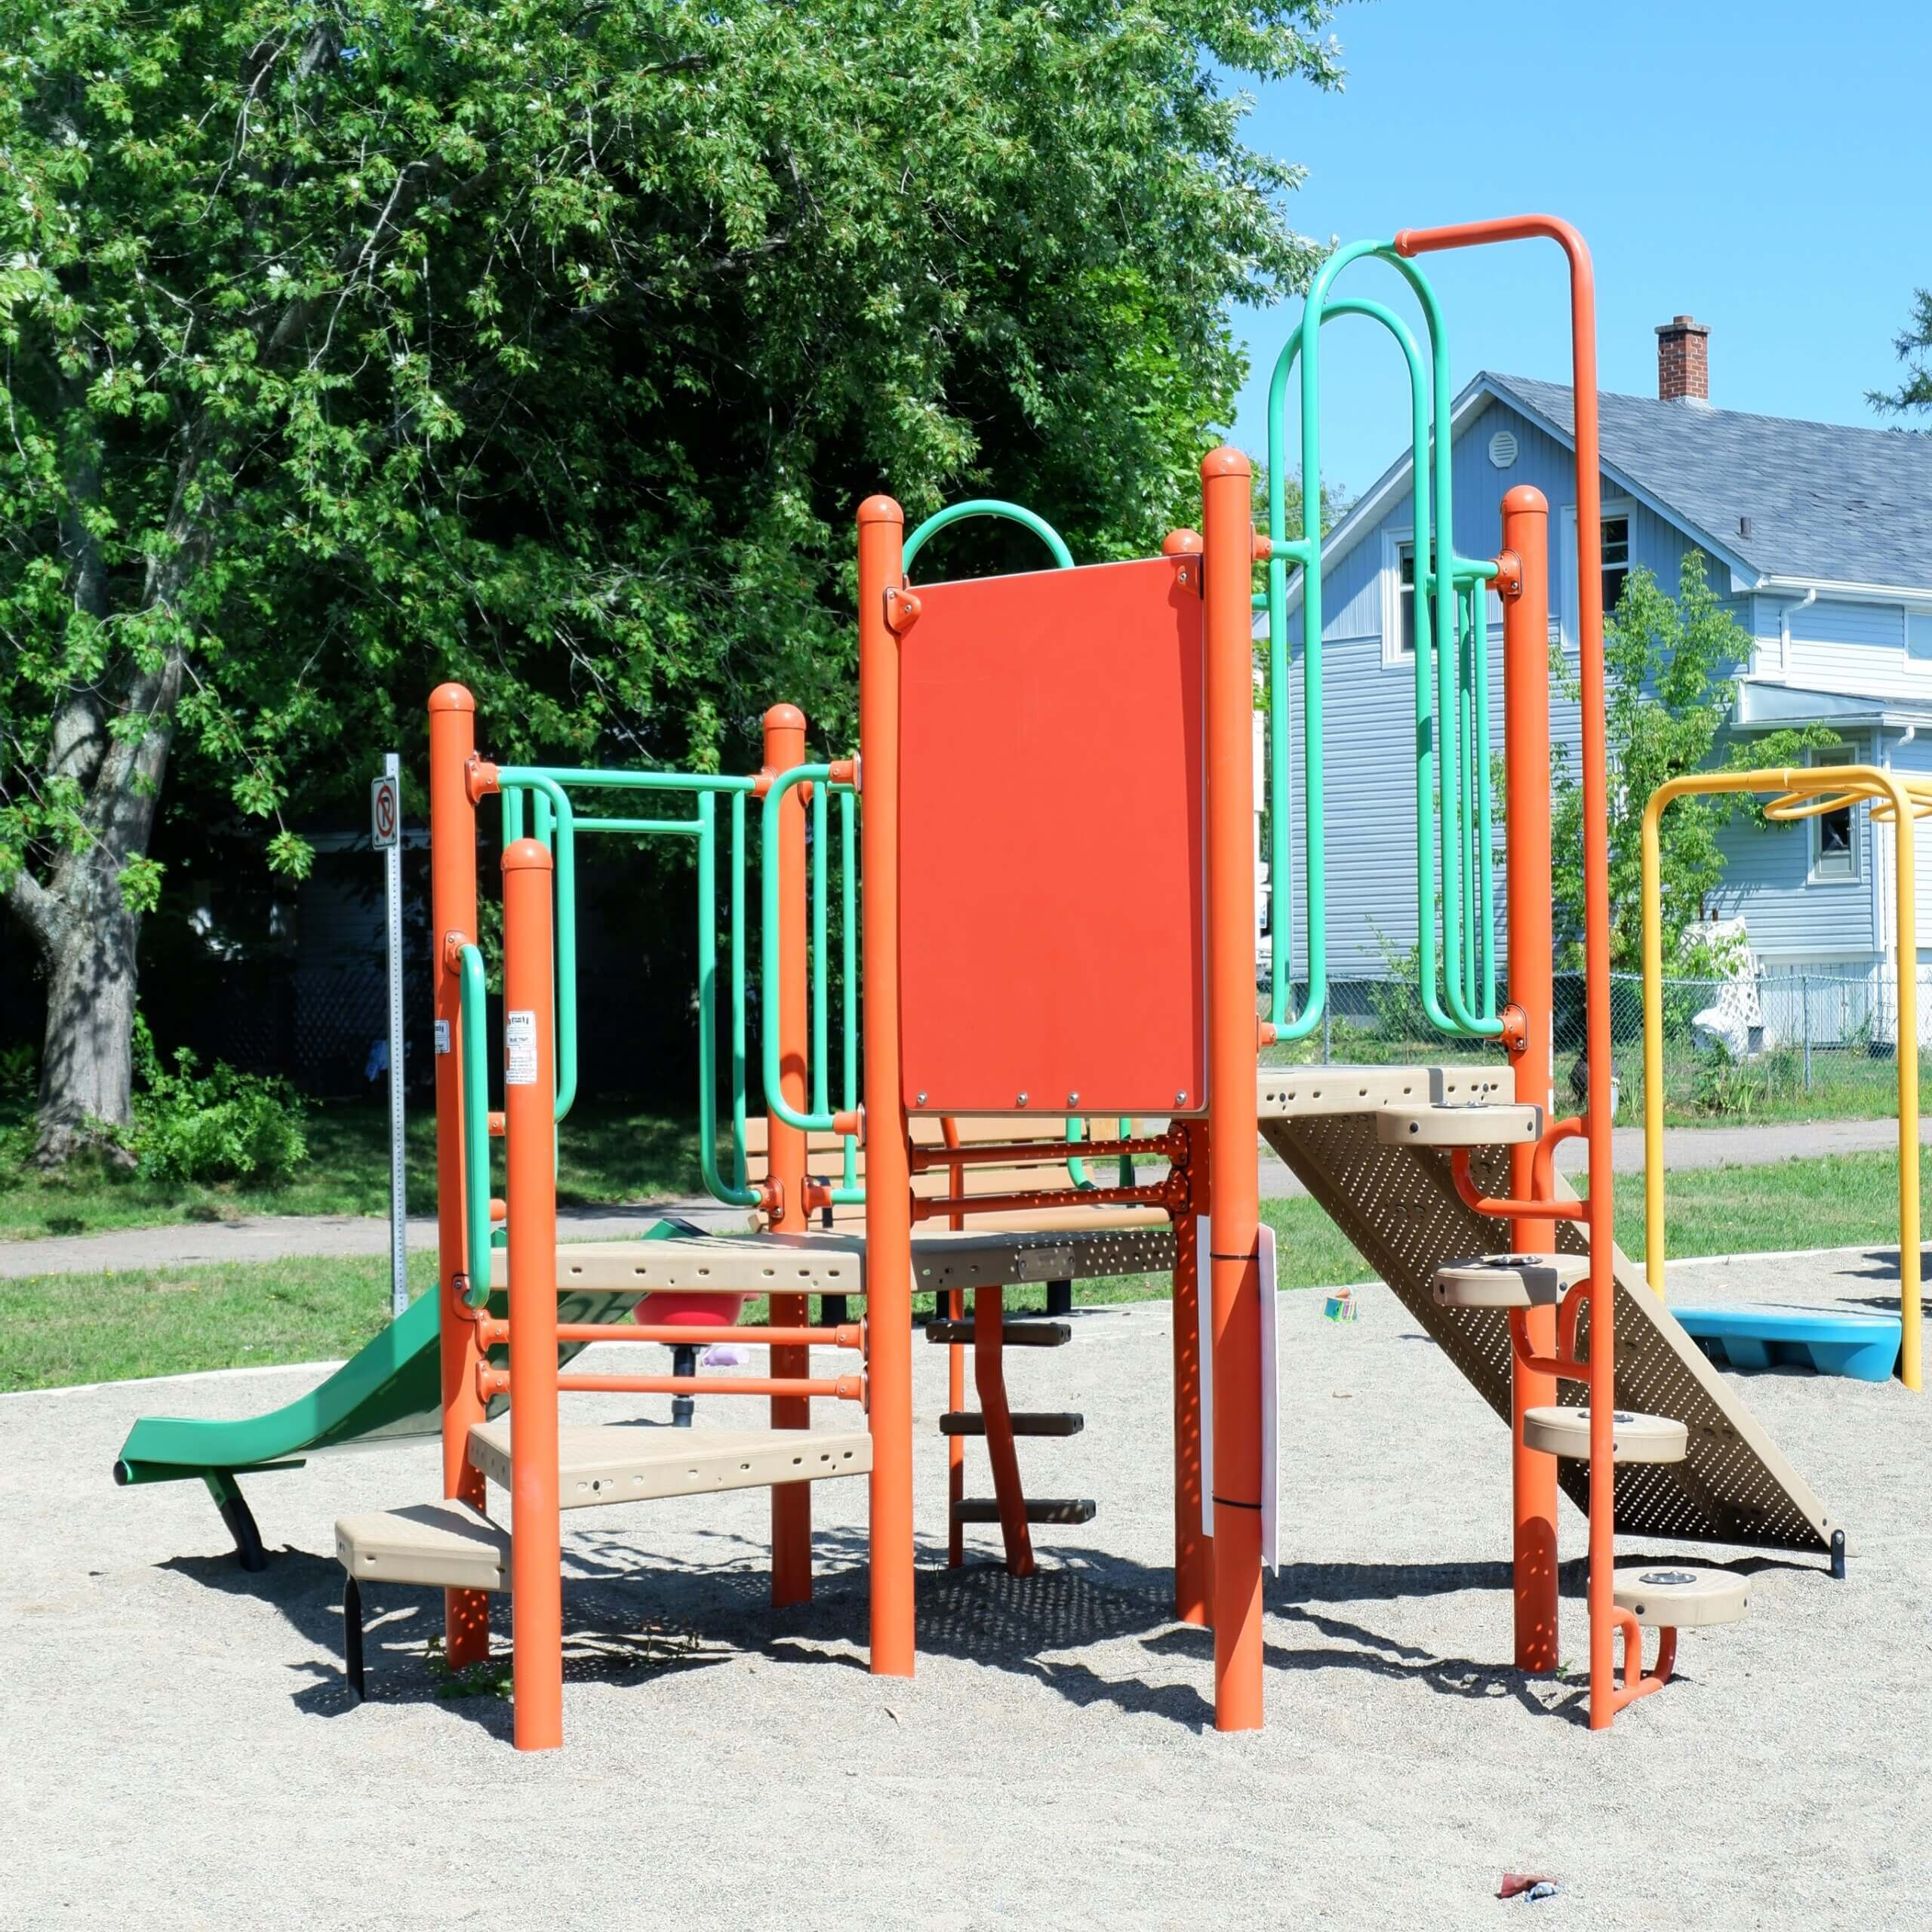 Braemar Park Centre Street Playground Moncton Pickle Planet small structure